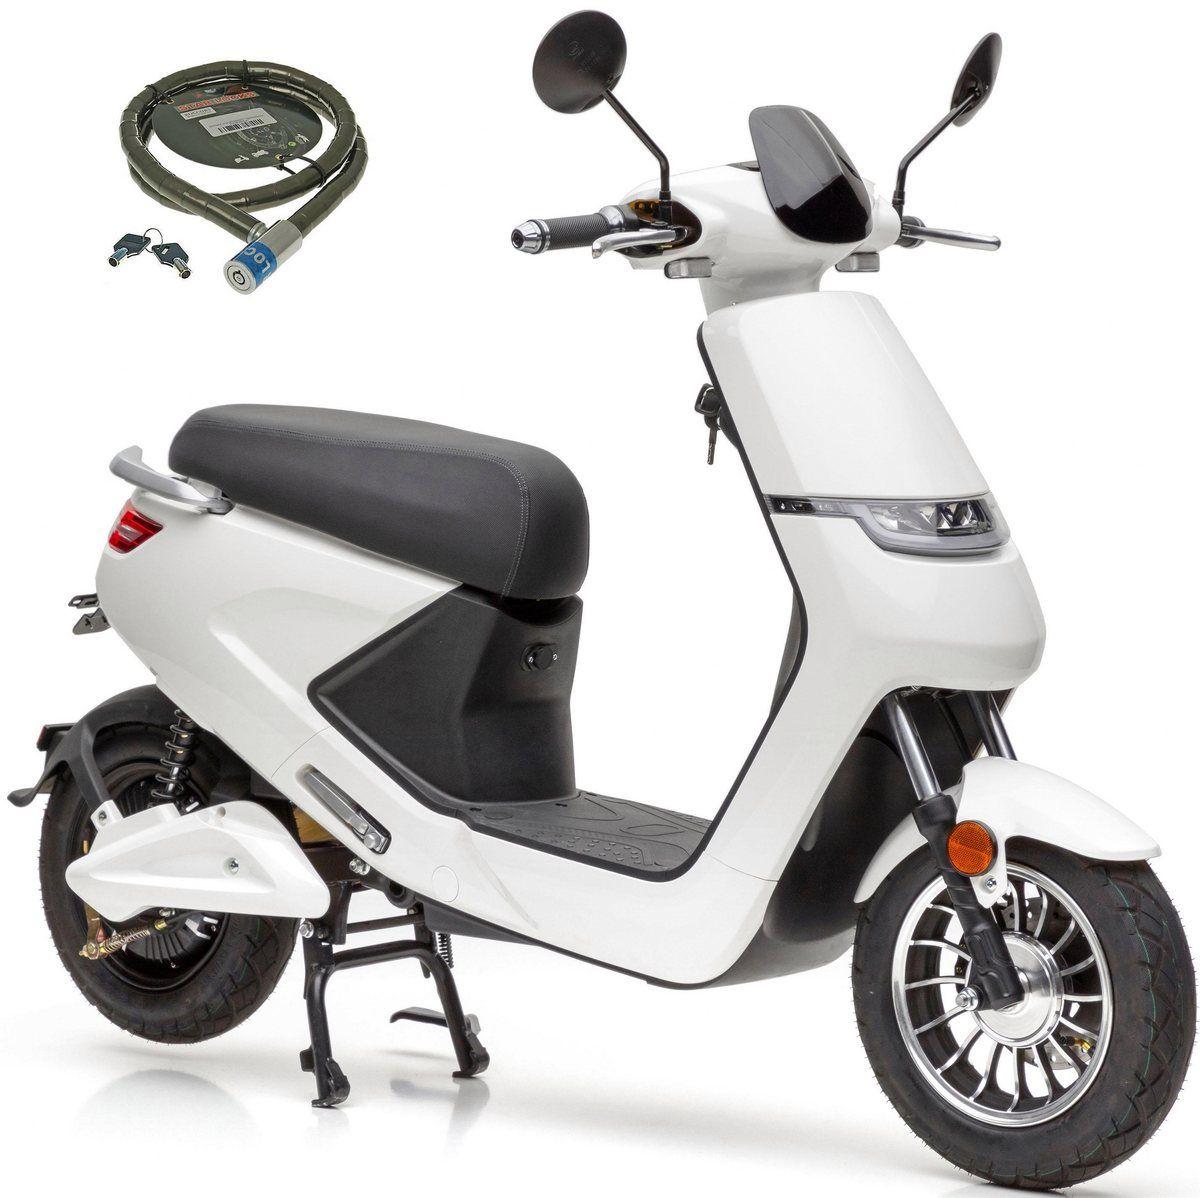 Nova Motors E Motorroller E Mace 2400 W 45 Km H Euro 4 Online Kaufen E Scooter Scooter Motorbikes